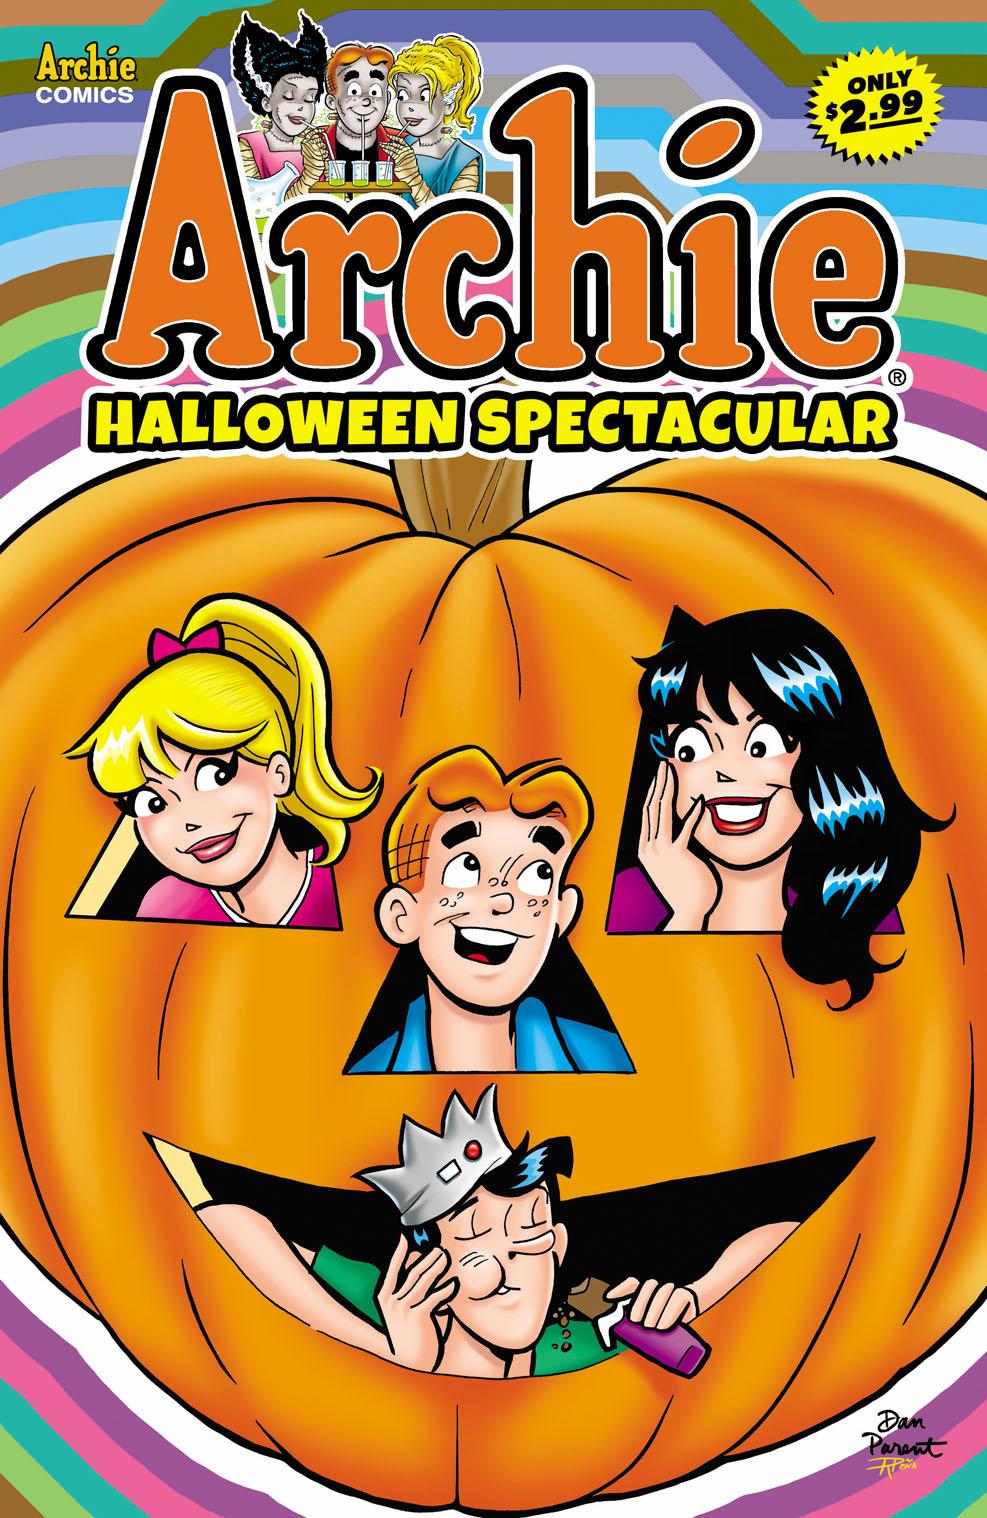 ArchieHallowSpec Archie Comic Publications October 2021 Solicitations